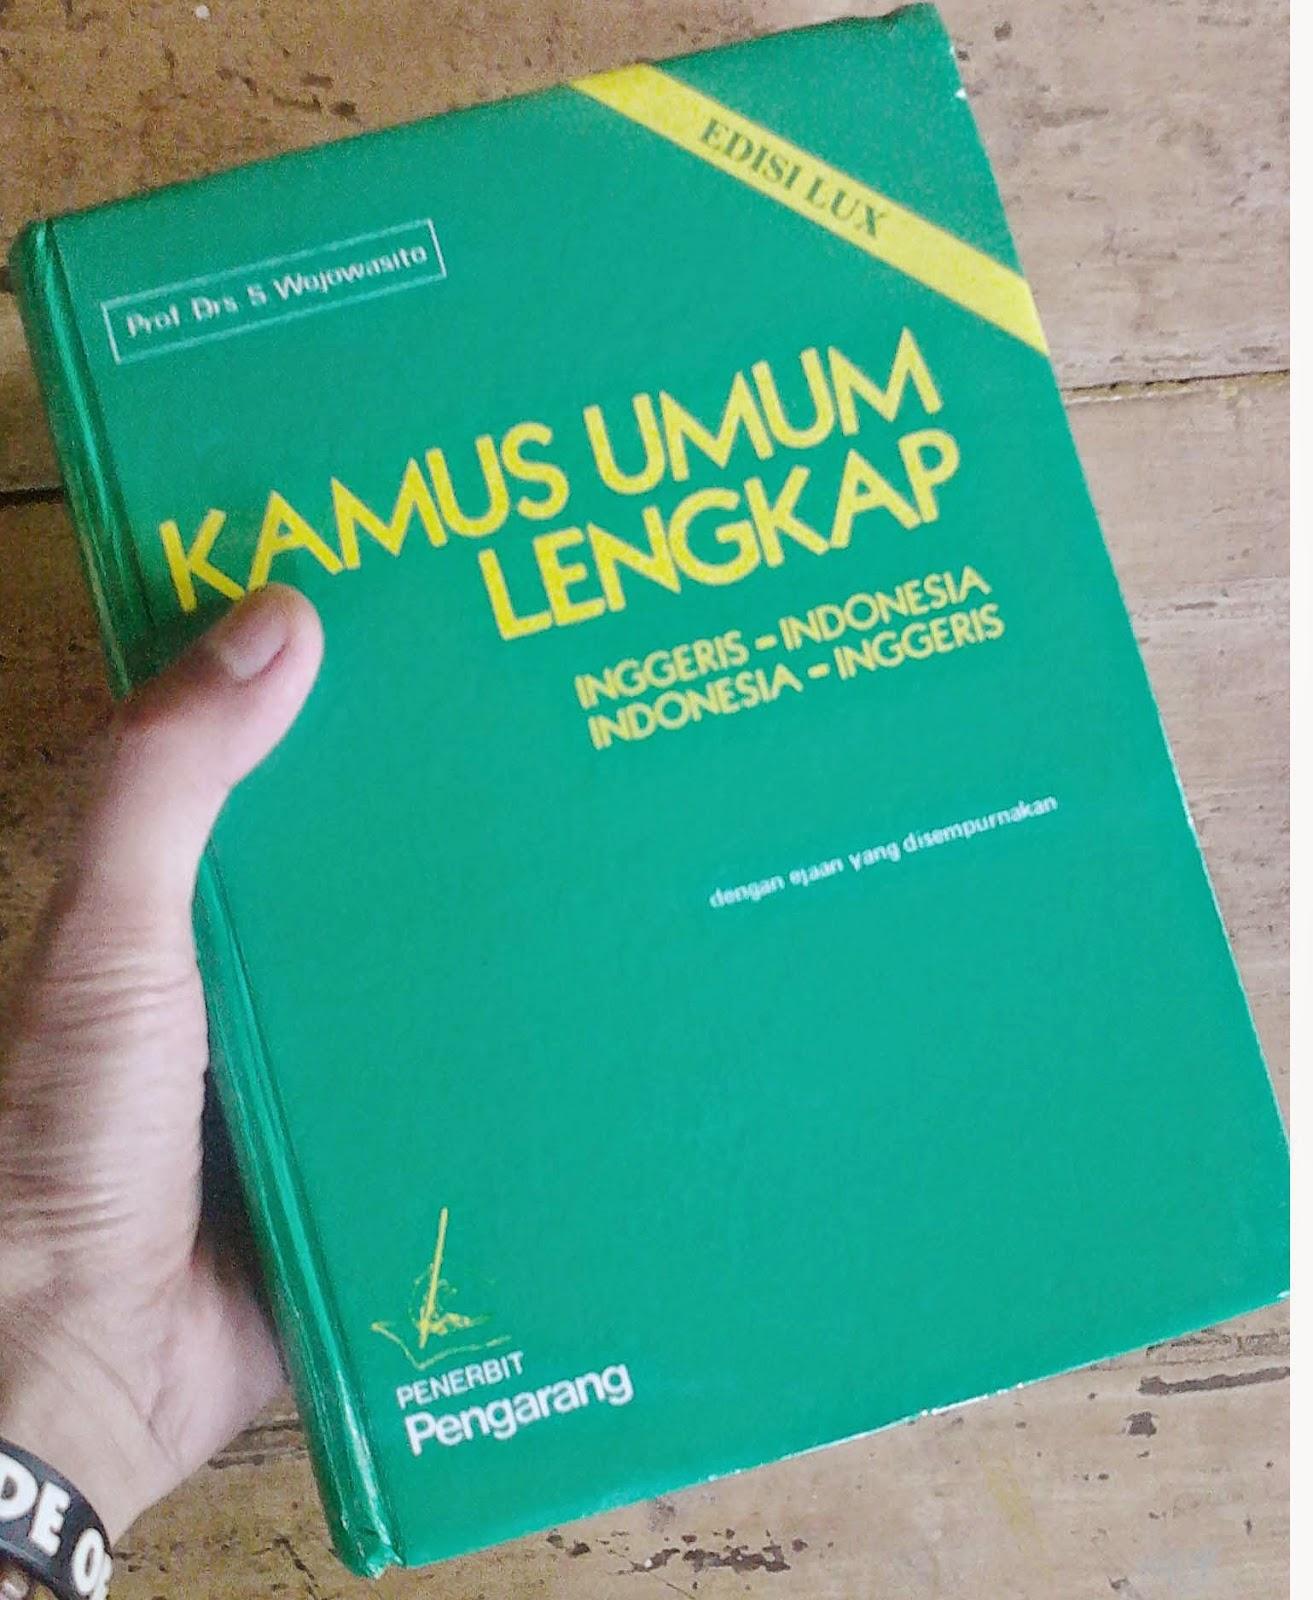 kamus bahasa inggris lengkap, belajar bahasa inggris, kamus wojowasito